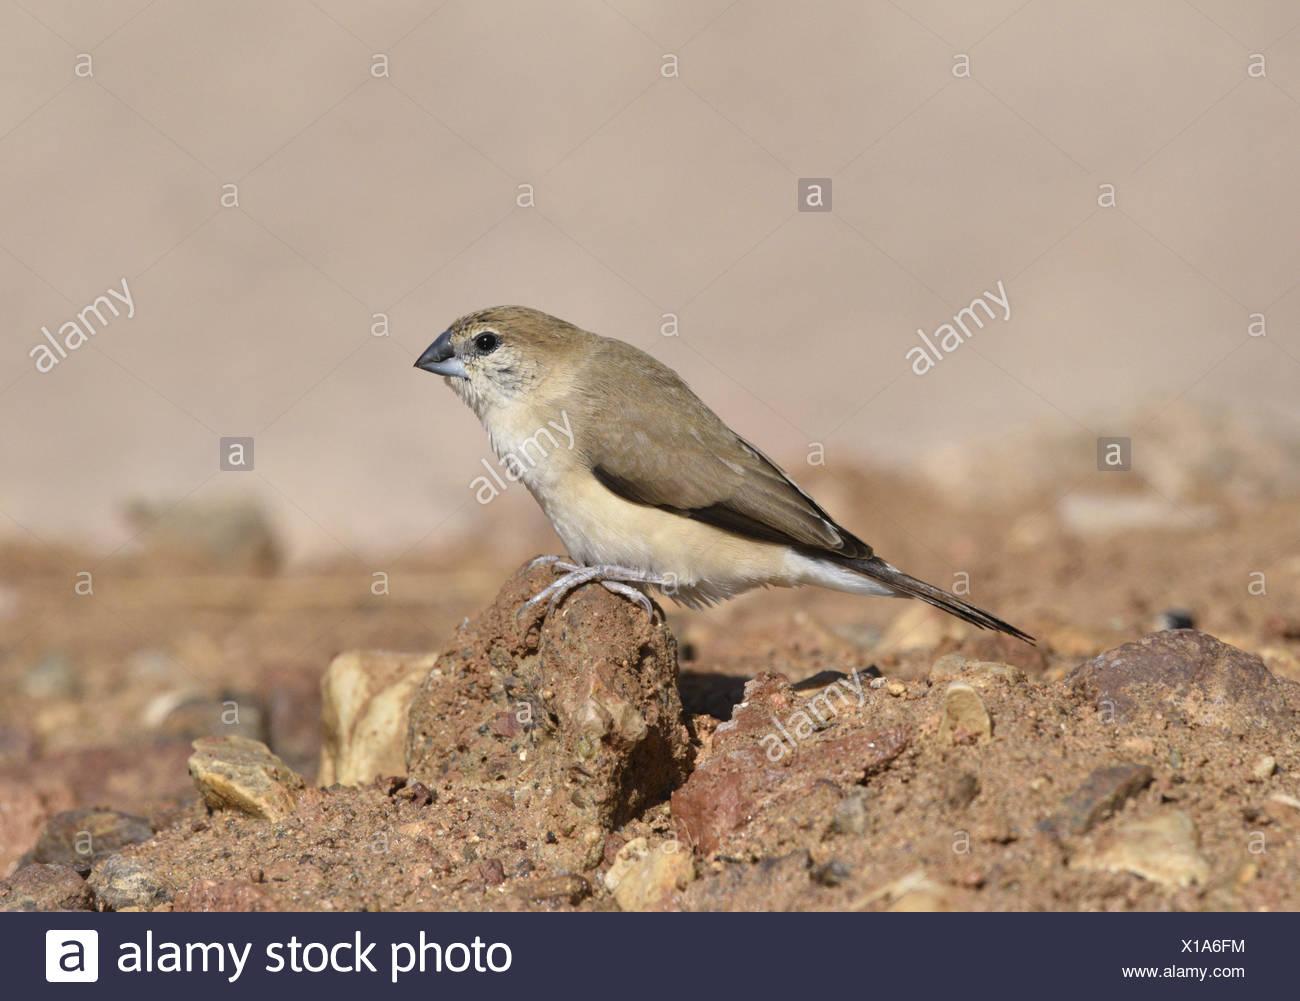 Indian Silverbill (or White-throated munia)- Euodice malabarica - Stock Image